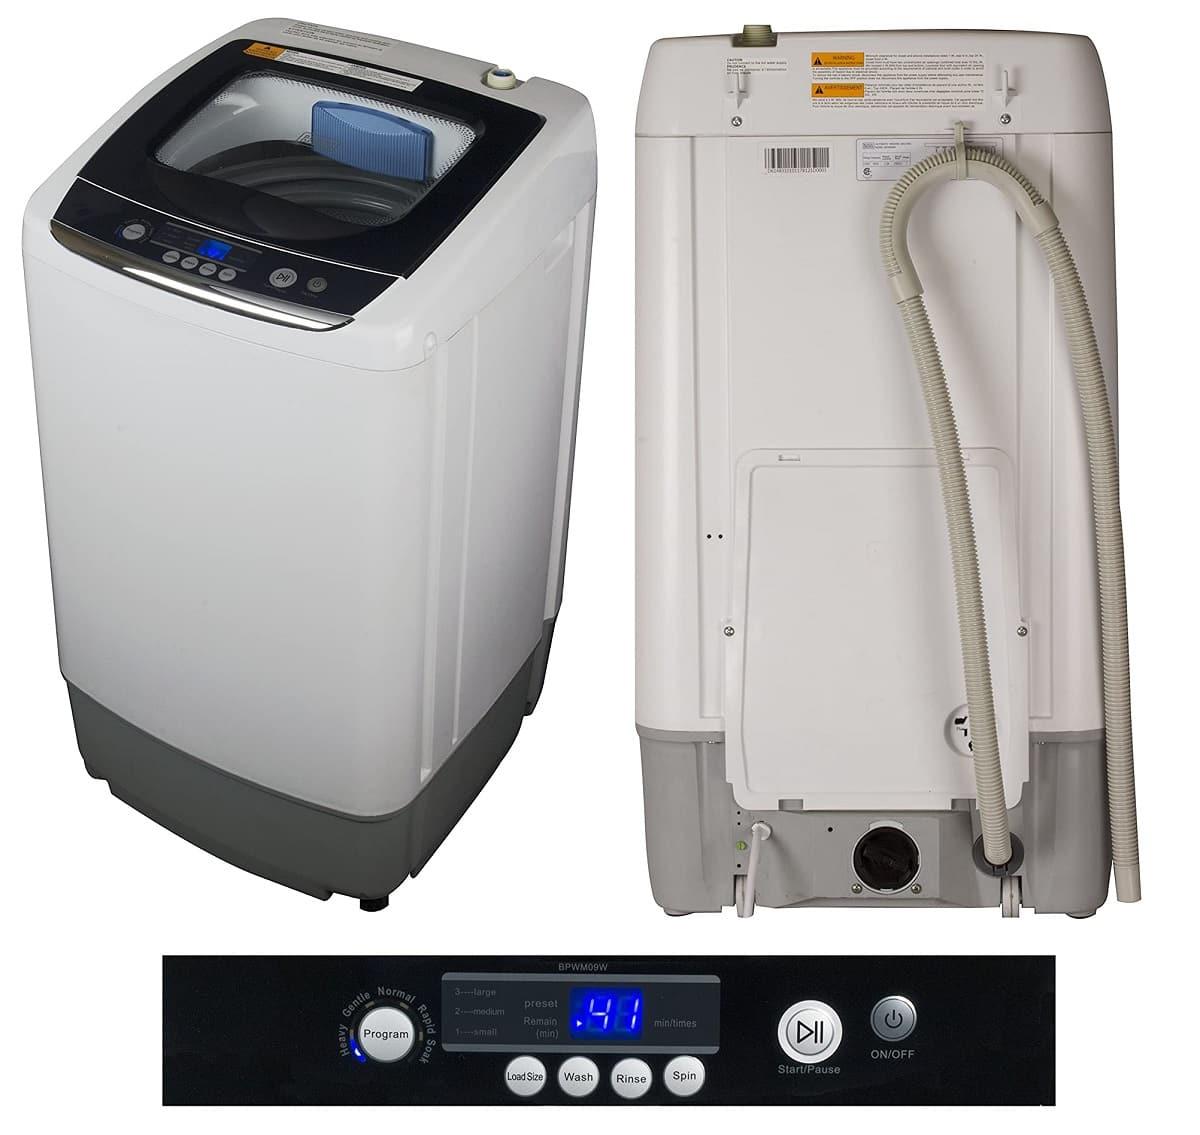 BLACK+DECKER BPWM09W Portable Washing Machine